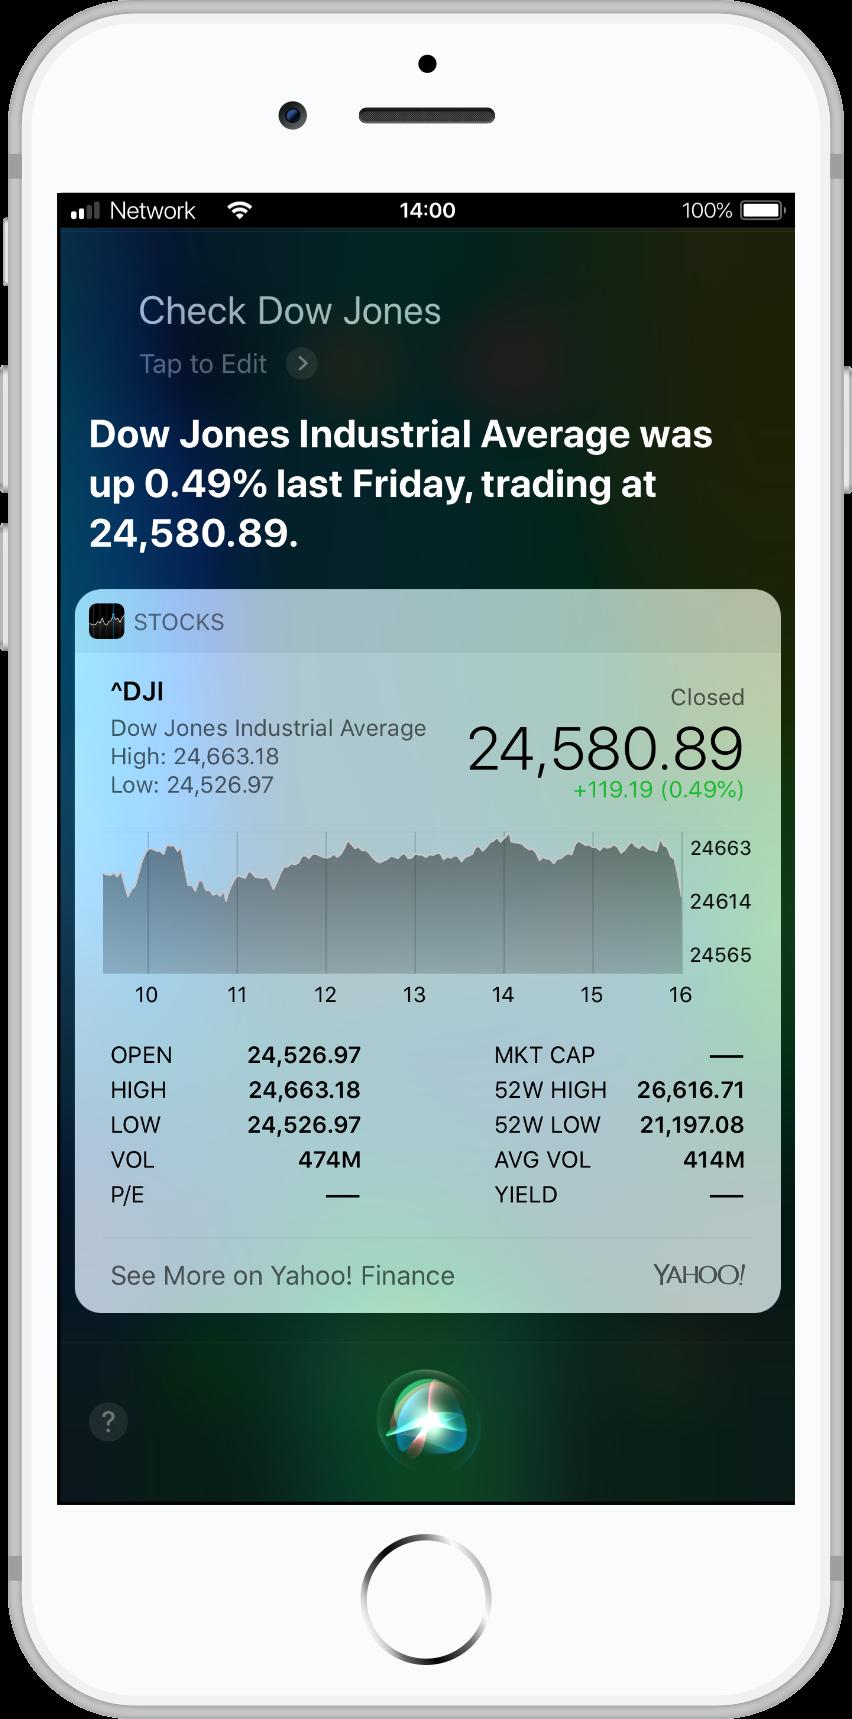 Check Dow Jones